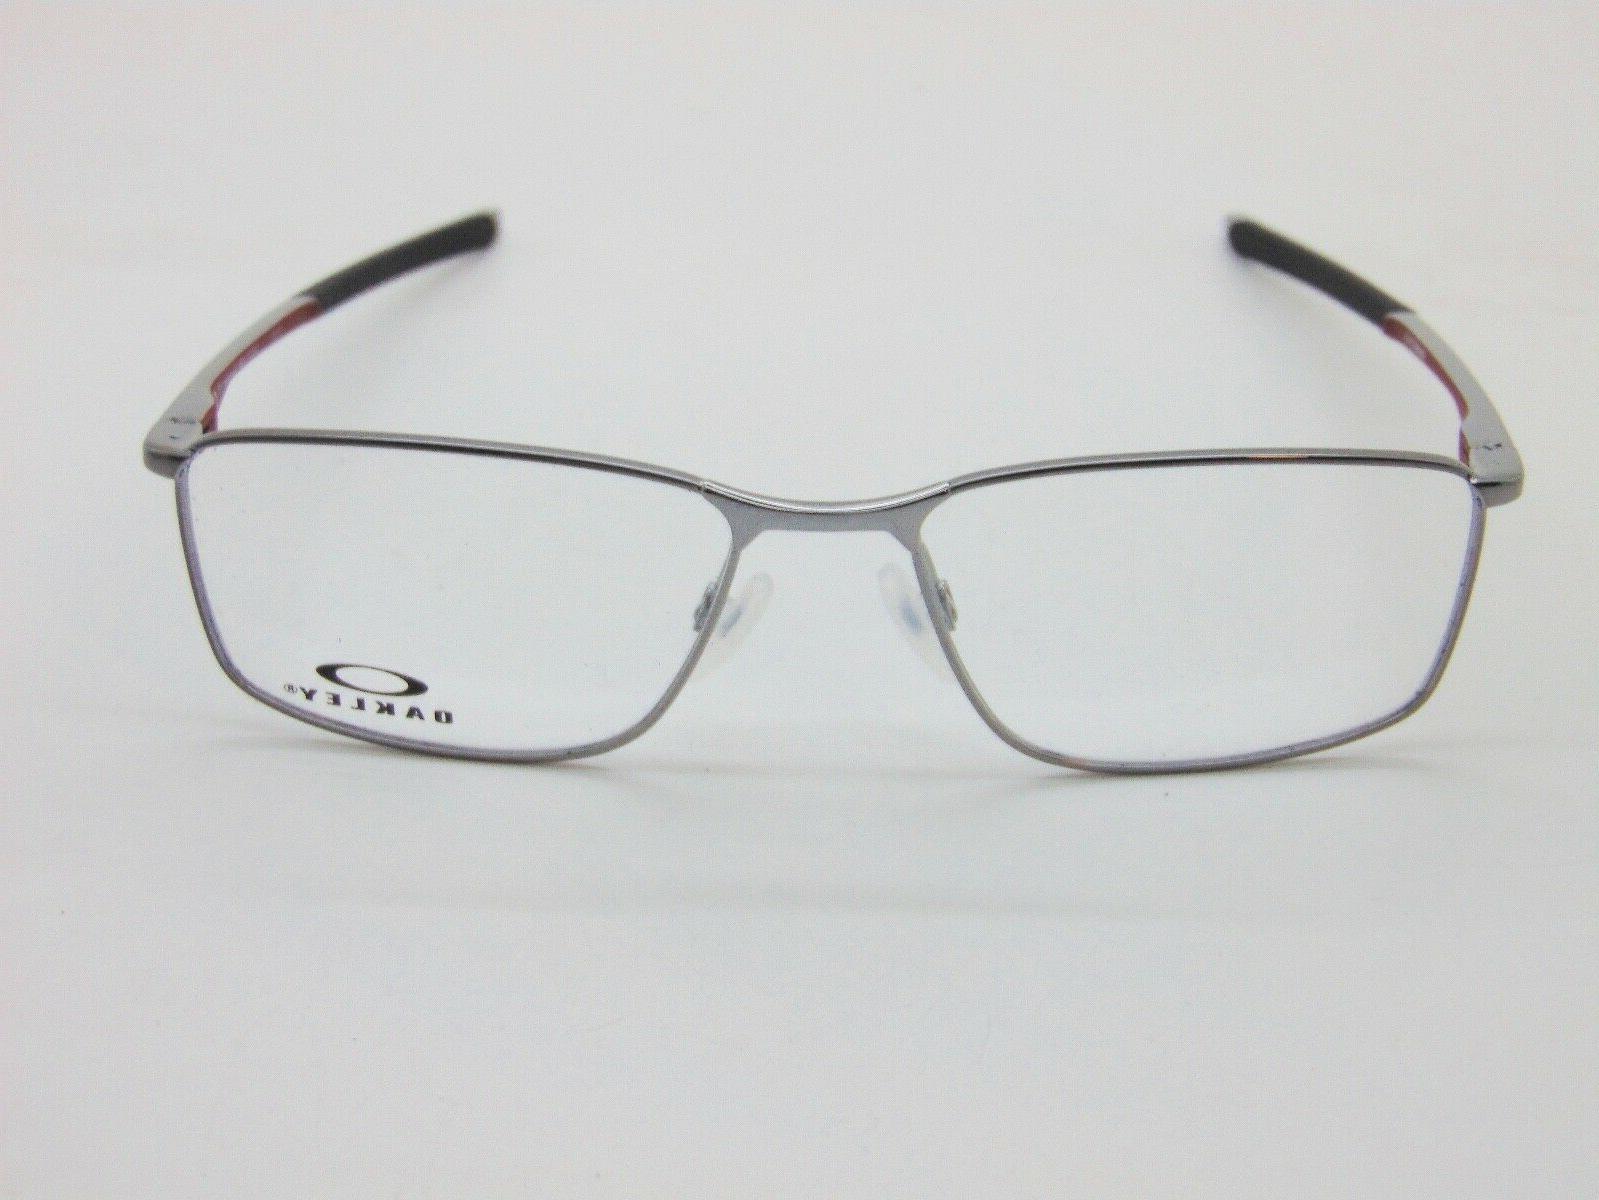 OAKLEY SOCKET 5.0 OX3217-0955 Gunmetal/Cardinal 55mm Rx Authentic Eyeglasses